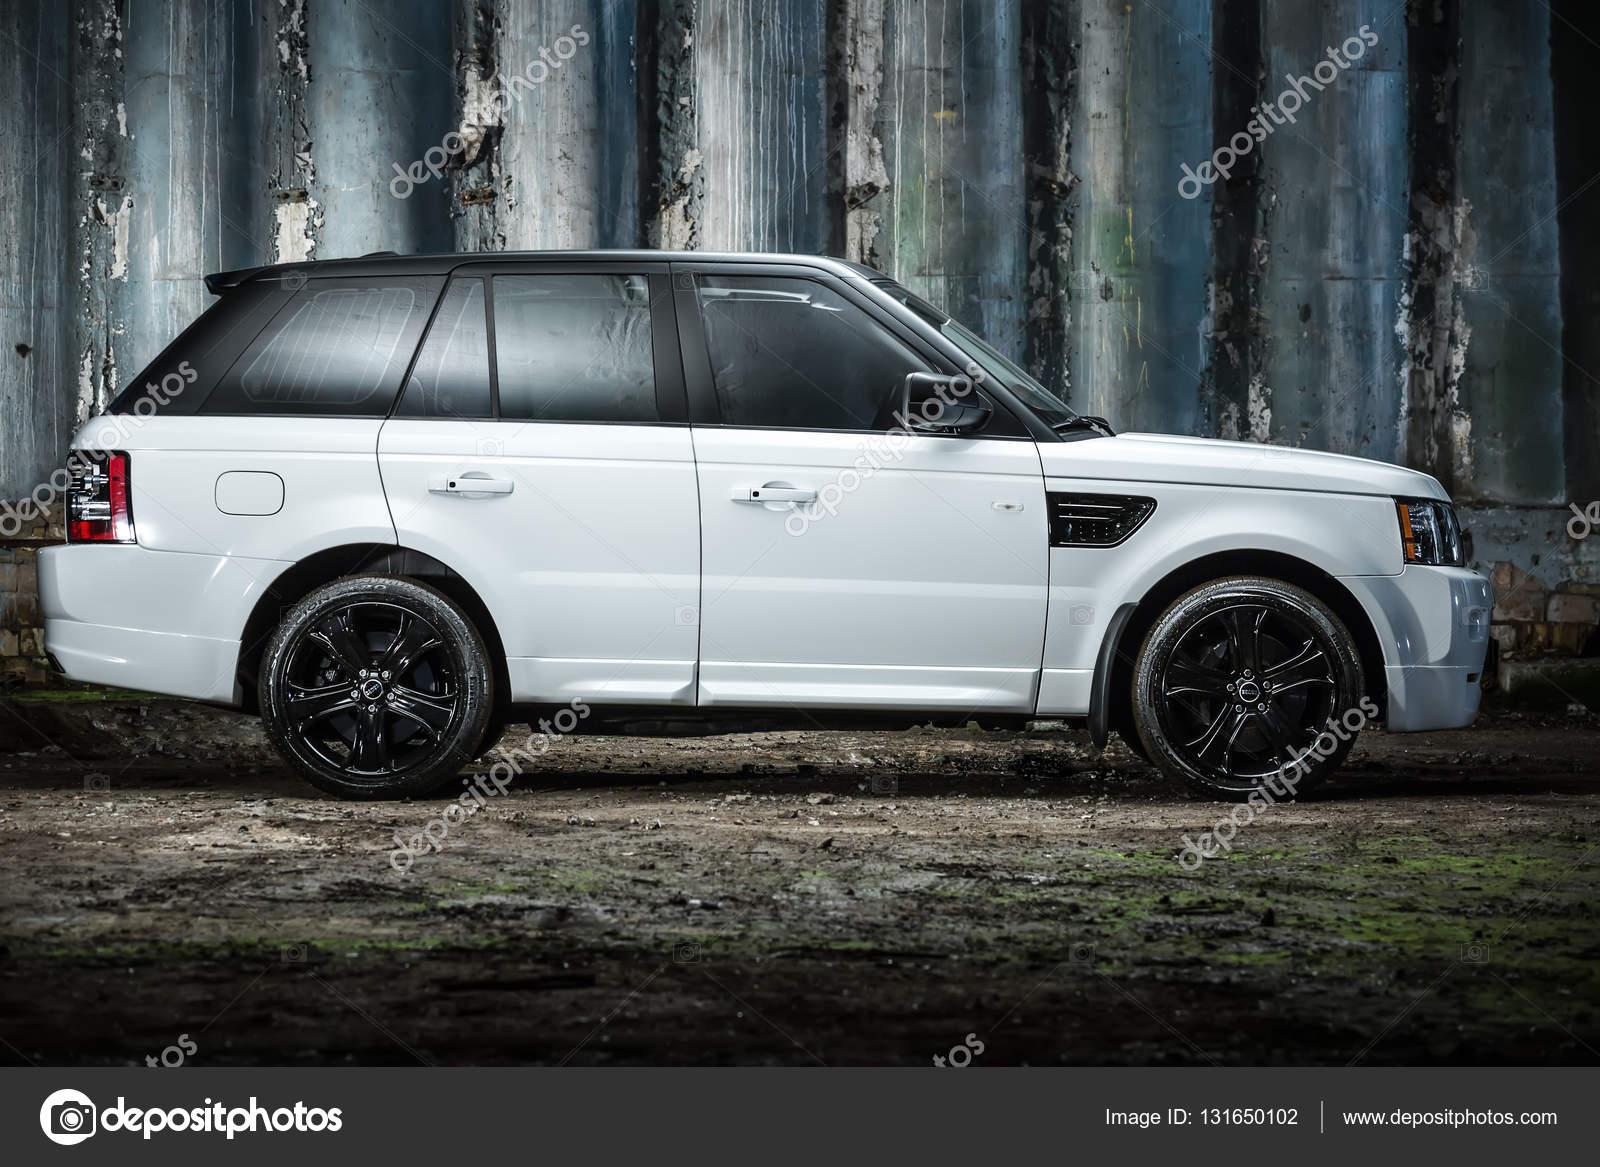 Range Rover Sport Tuning Stock Editorial Photo Bezikus - Range rover stock